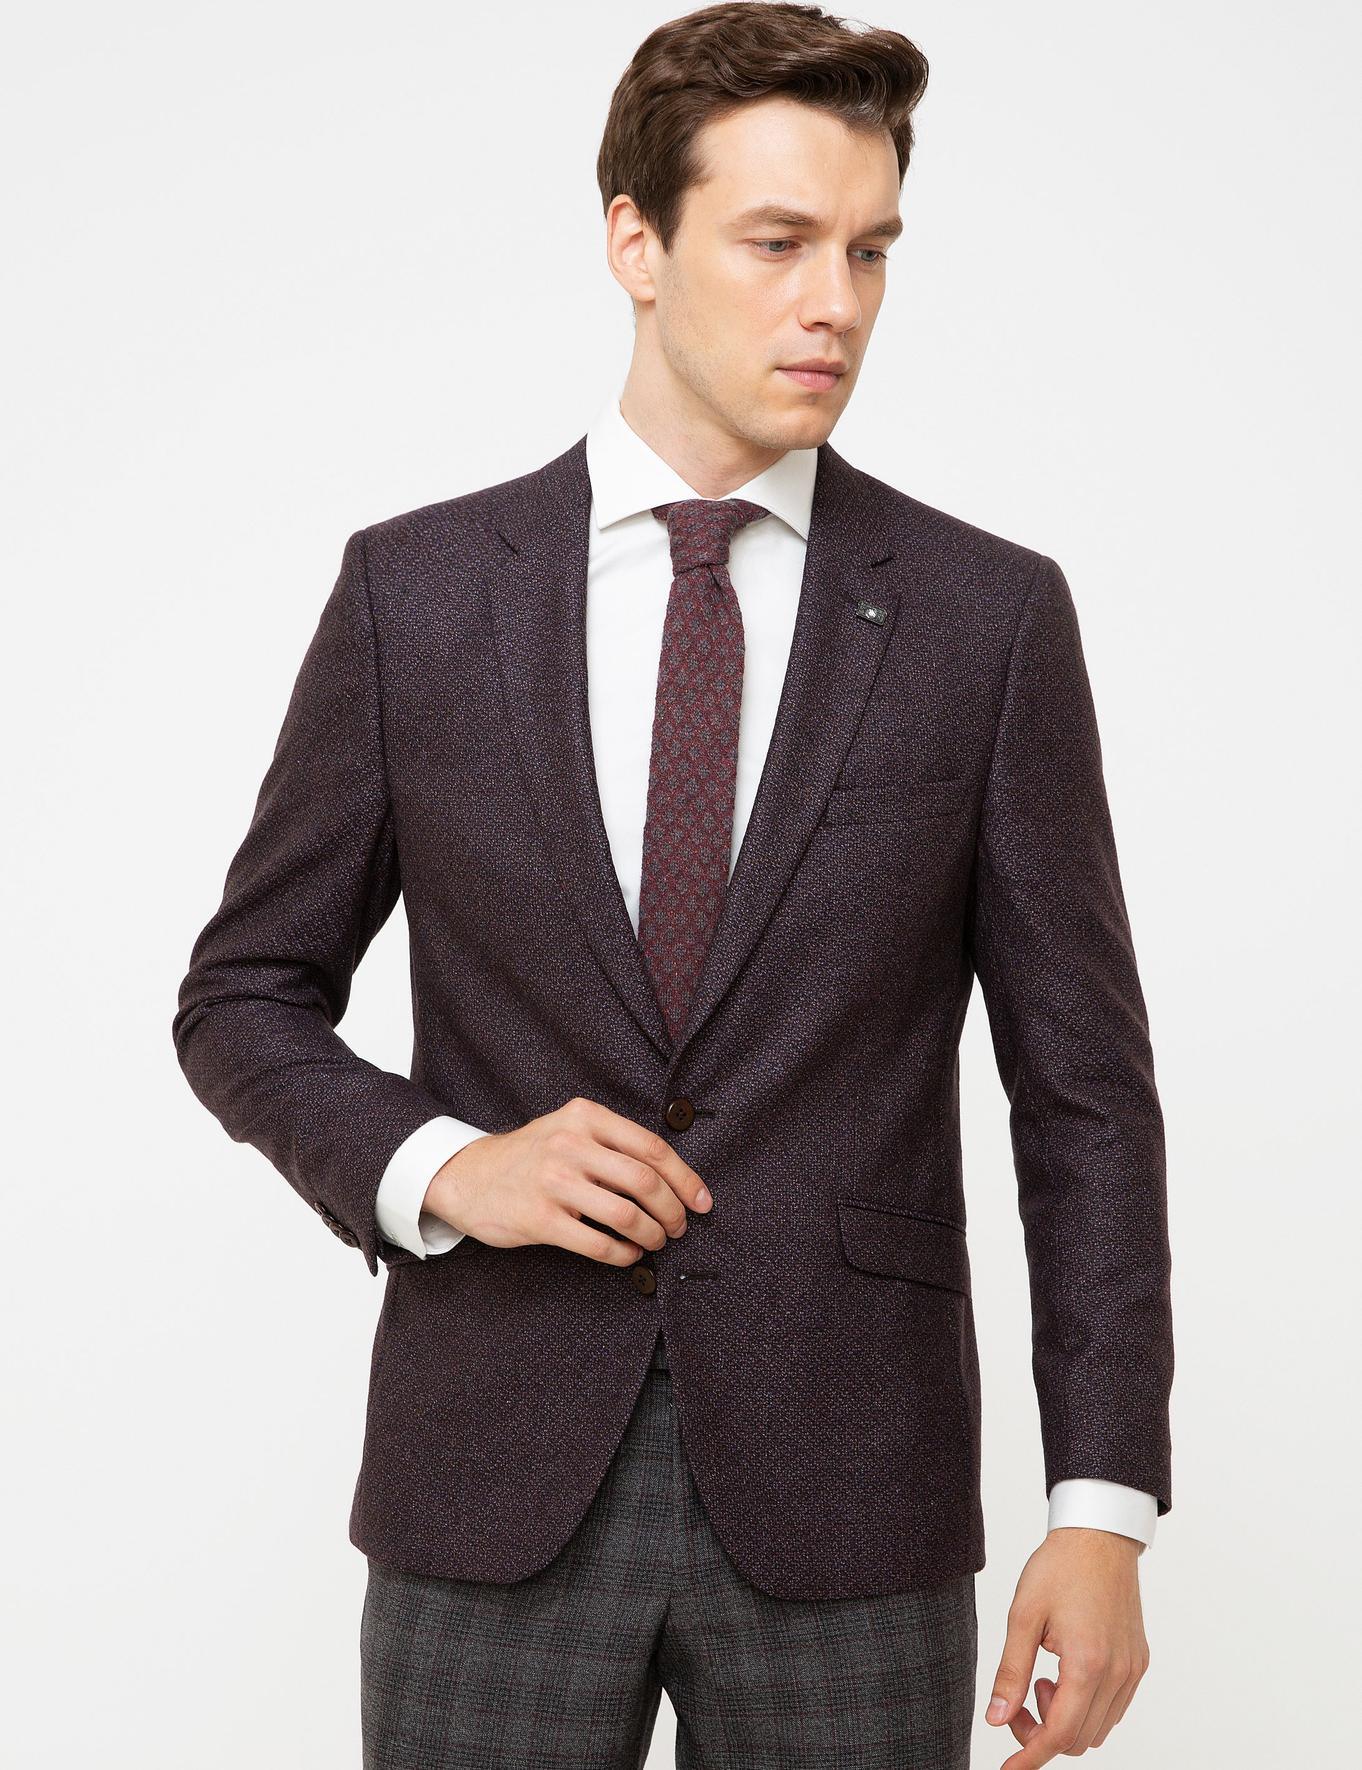 Bordo Slim Fit Ceket - 50192572041